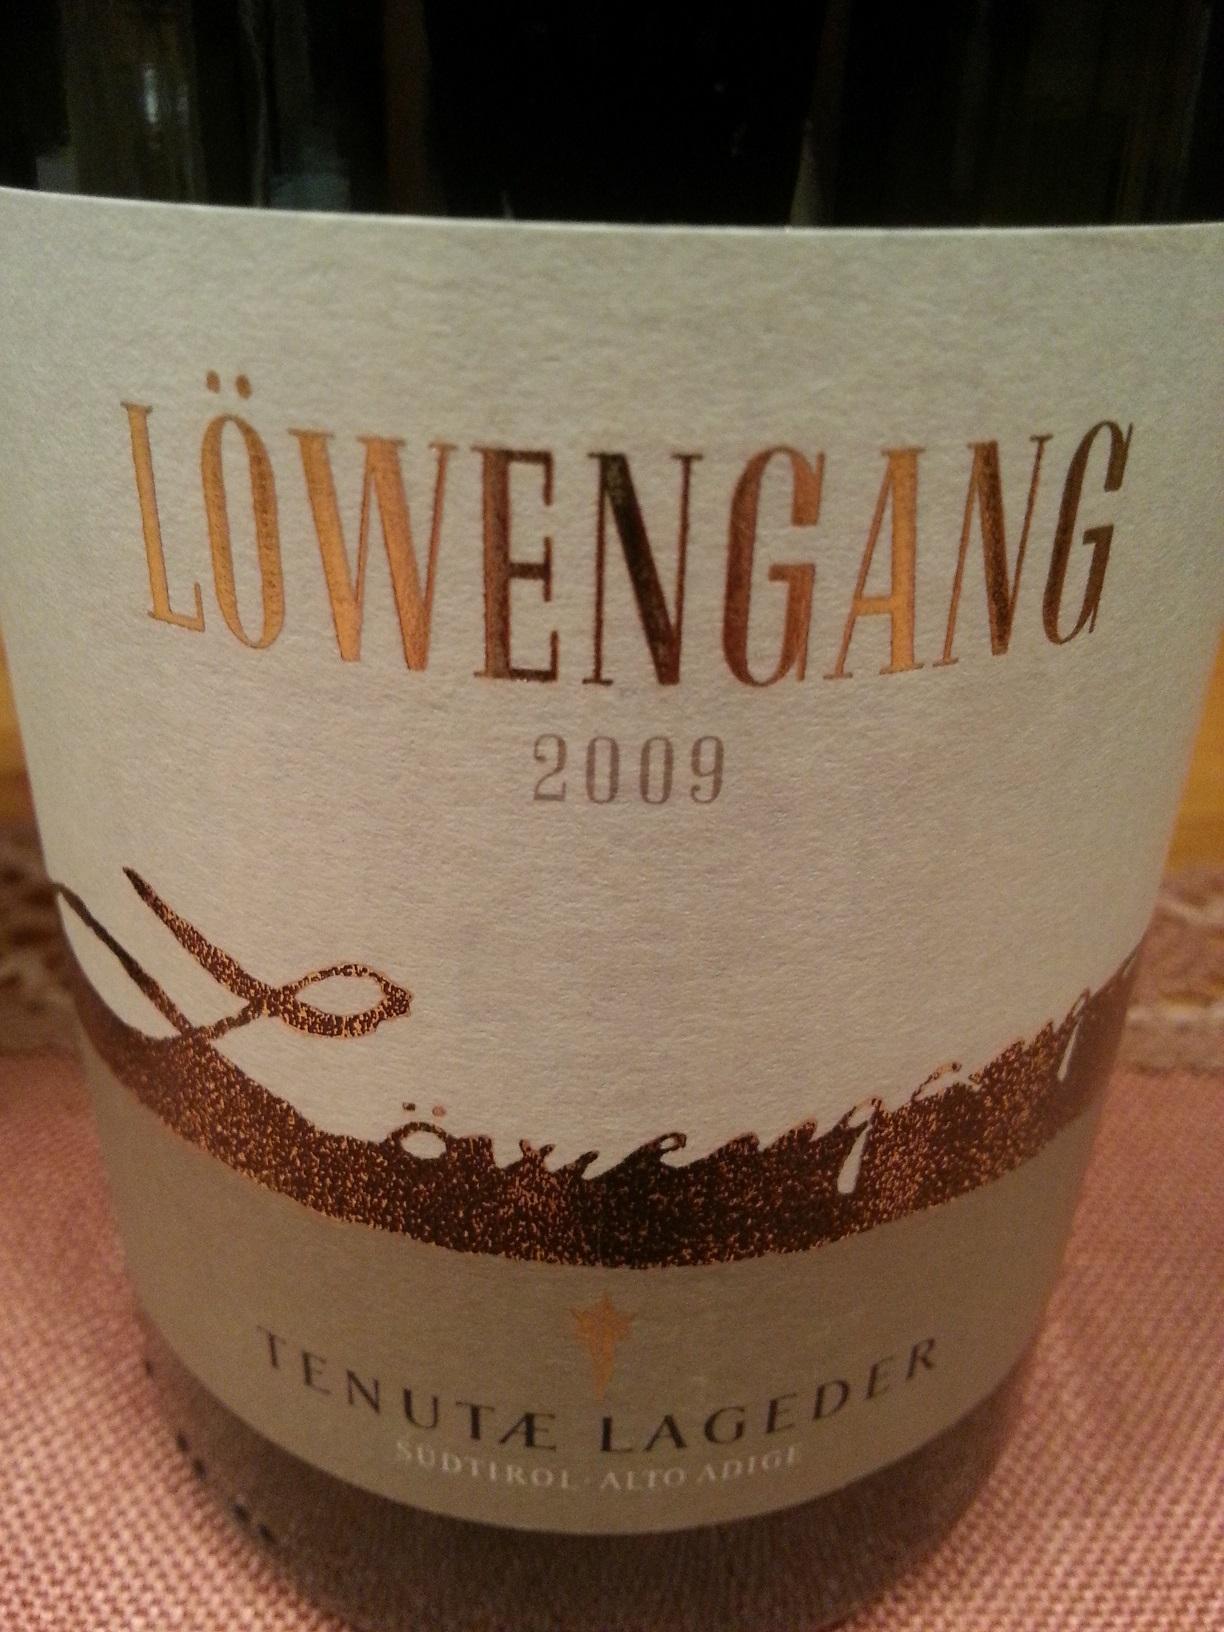 2009 Chardonnay Löwengang | Lageder